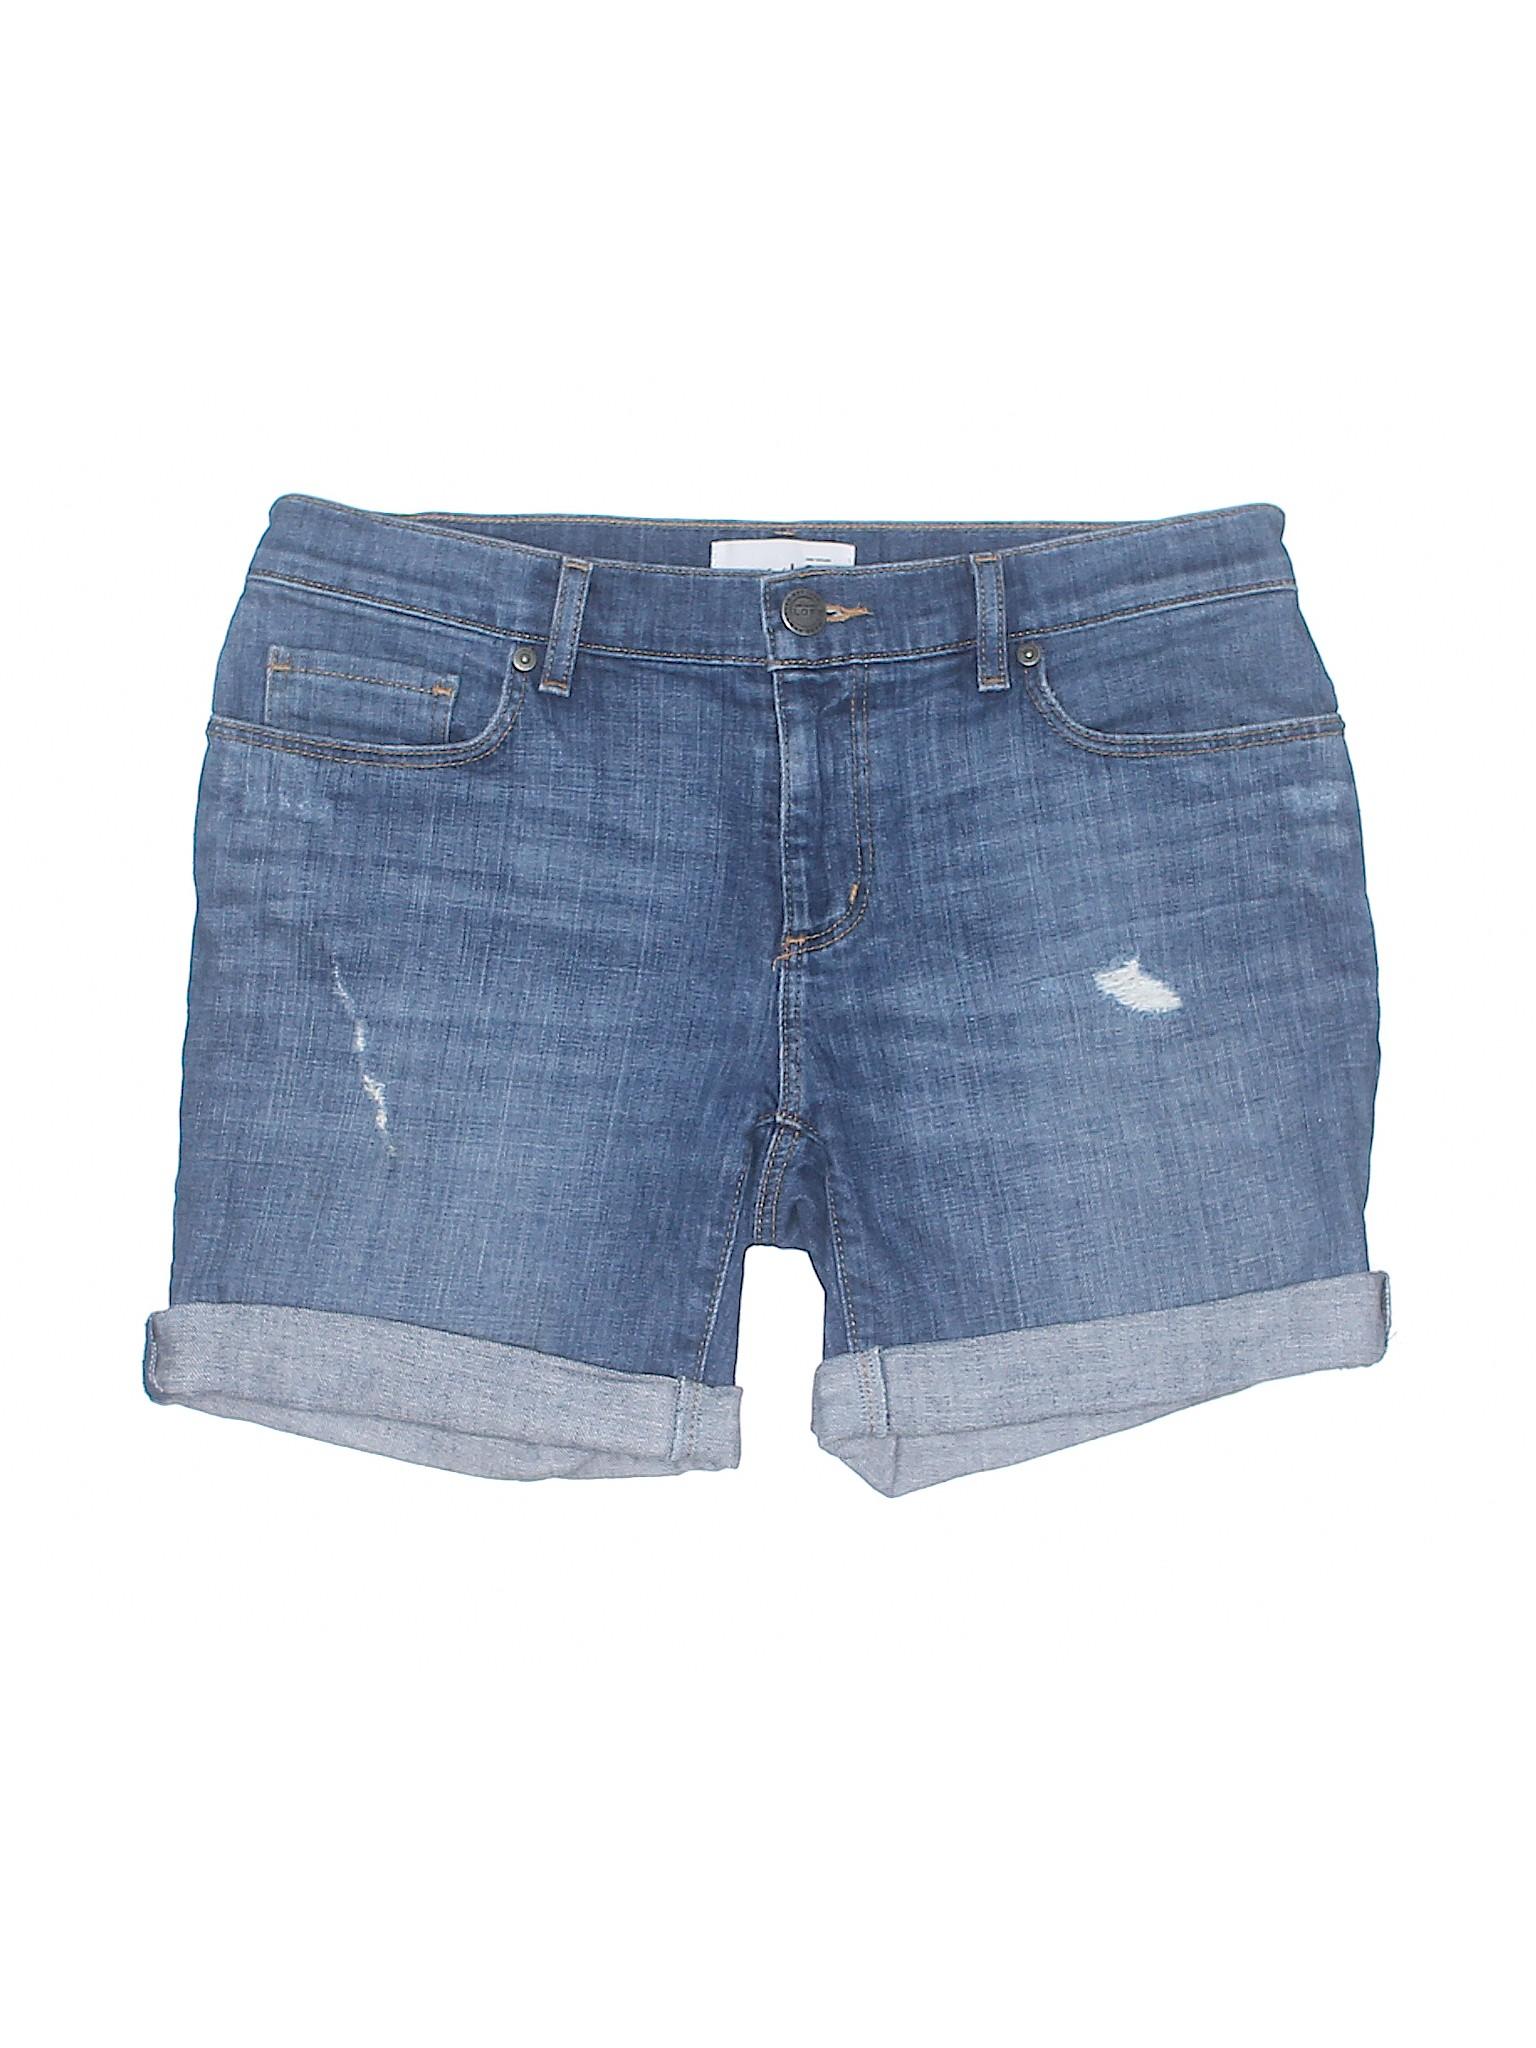 Shorts LOFT Taylor Boutique Ann Denim I1TUFxU